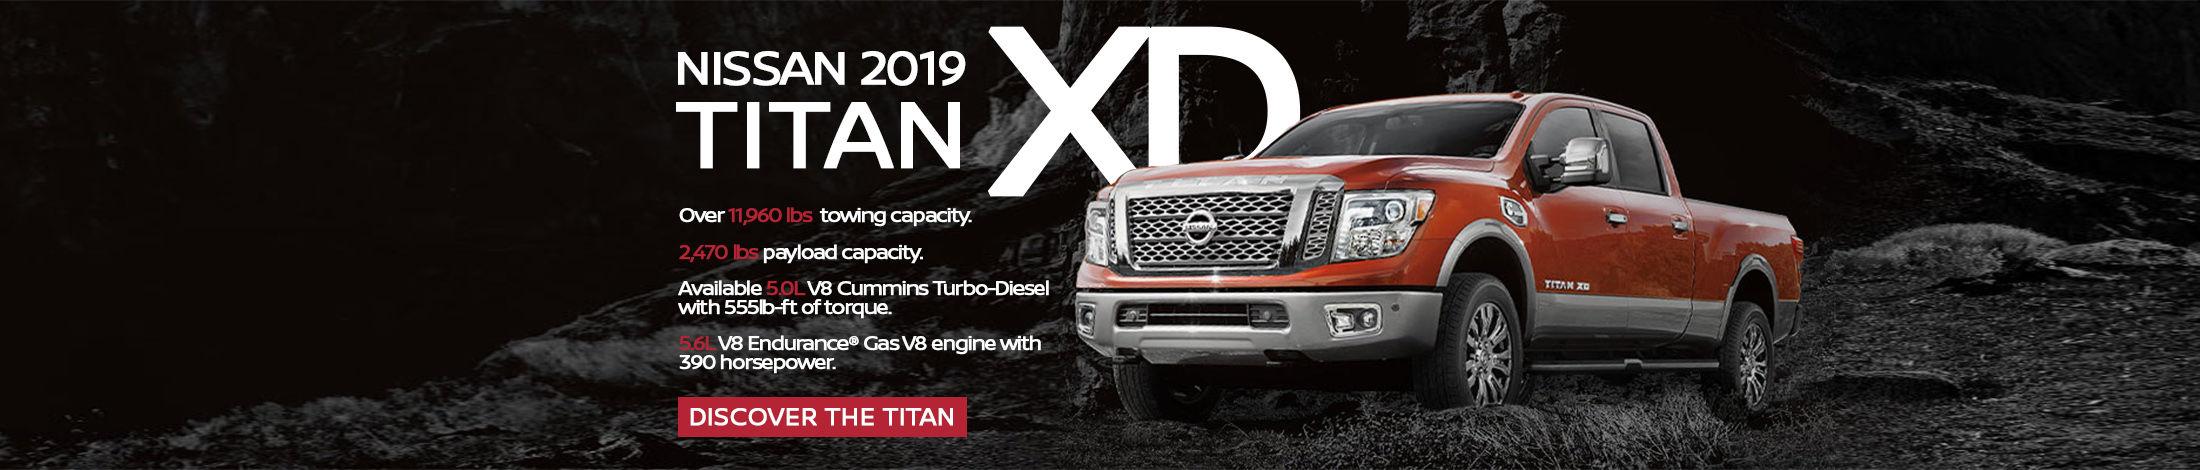 Titan-XD 2019